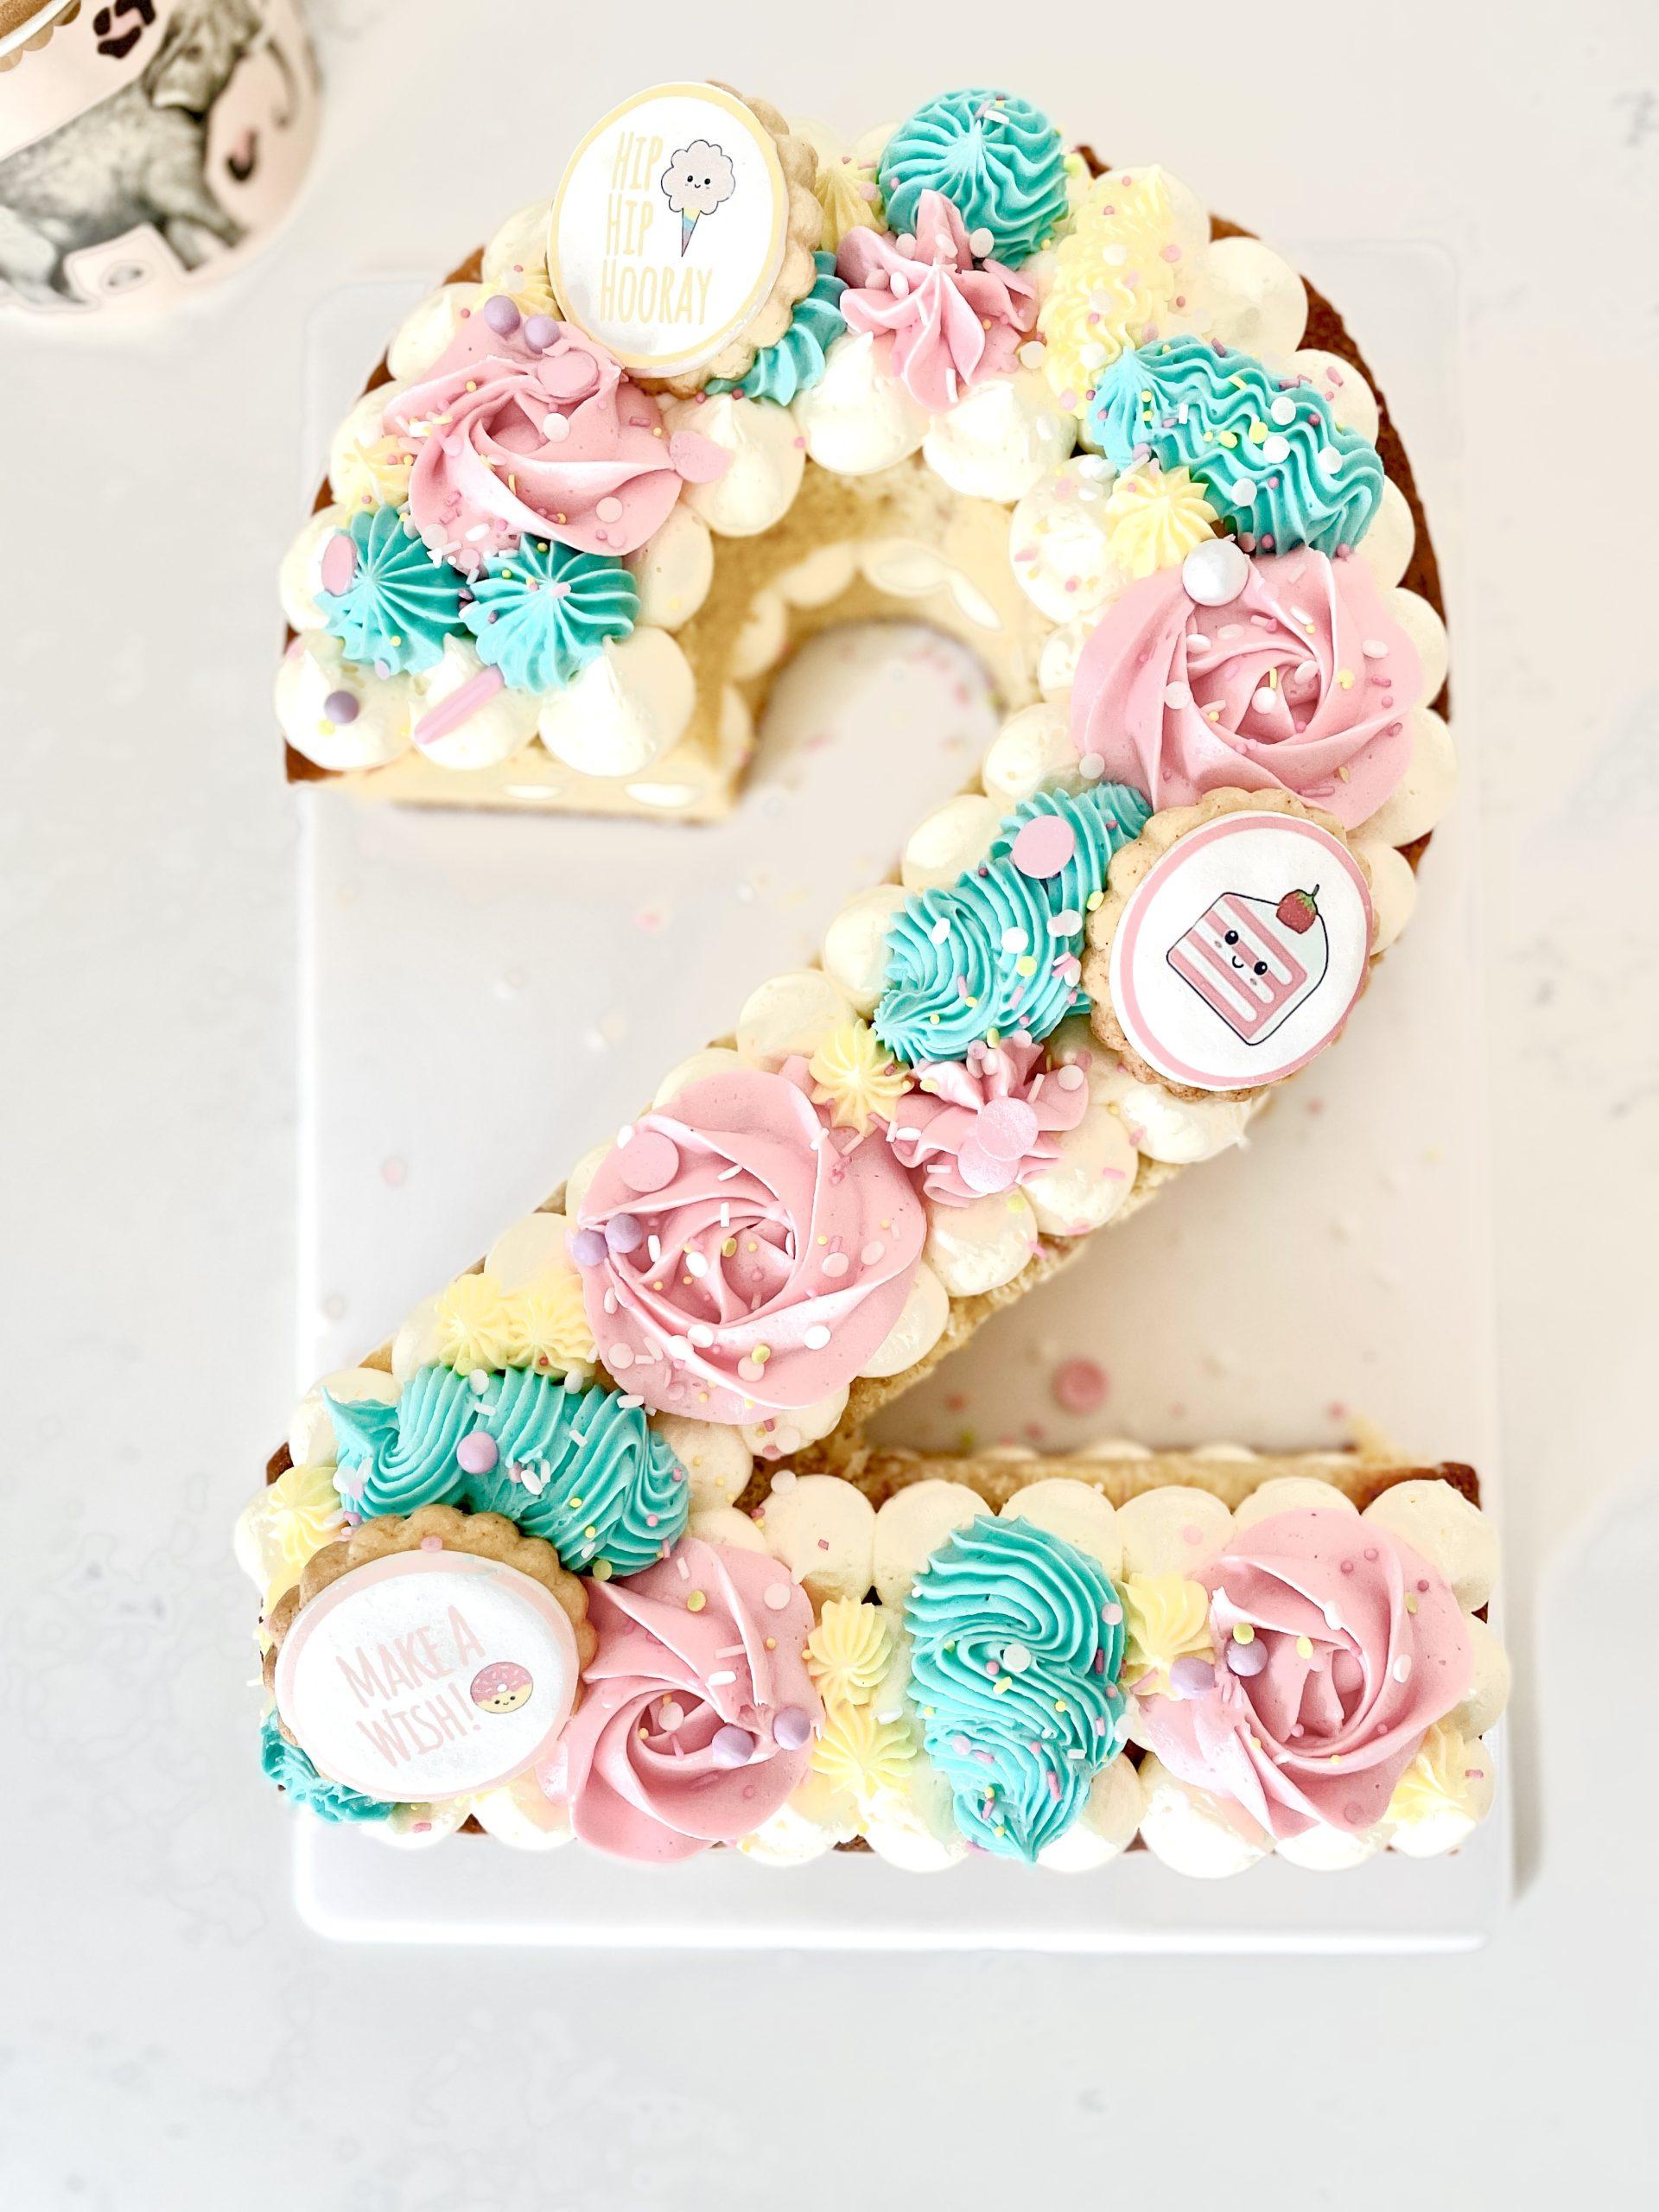 Personalised number cake